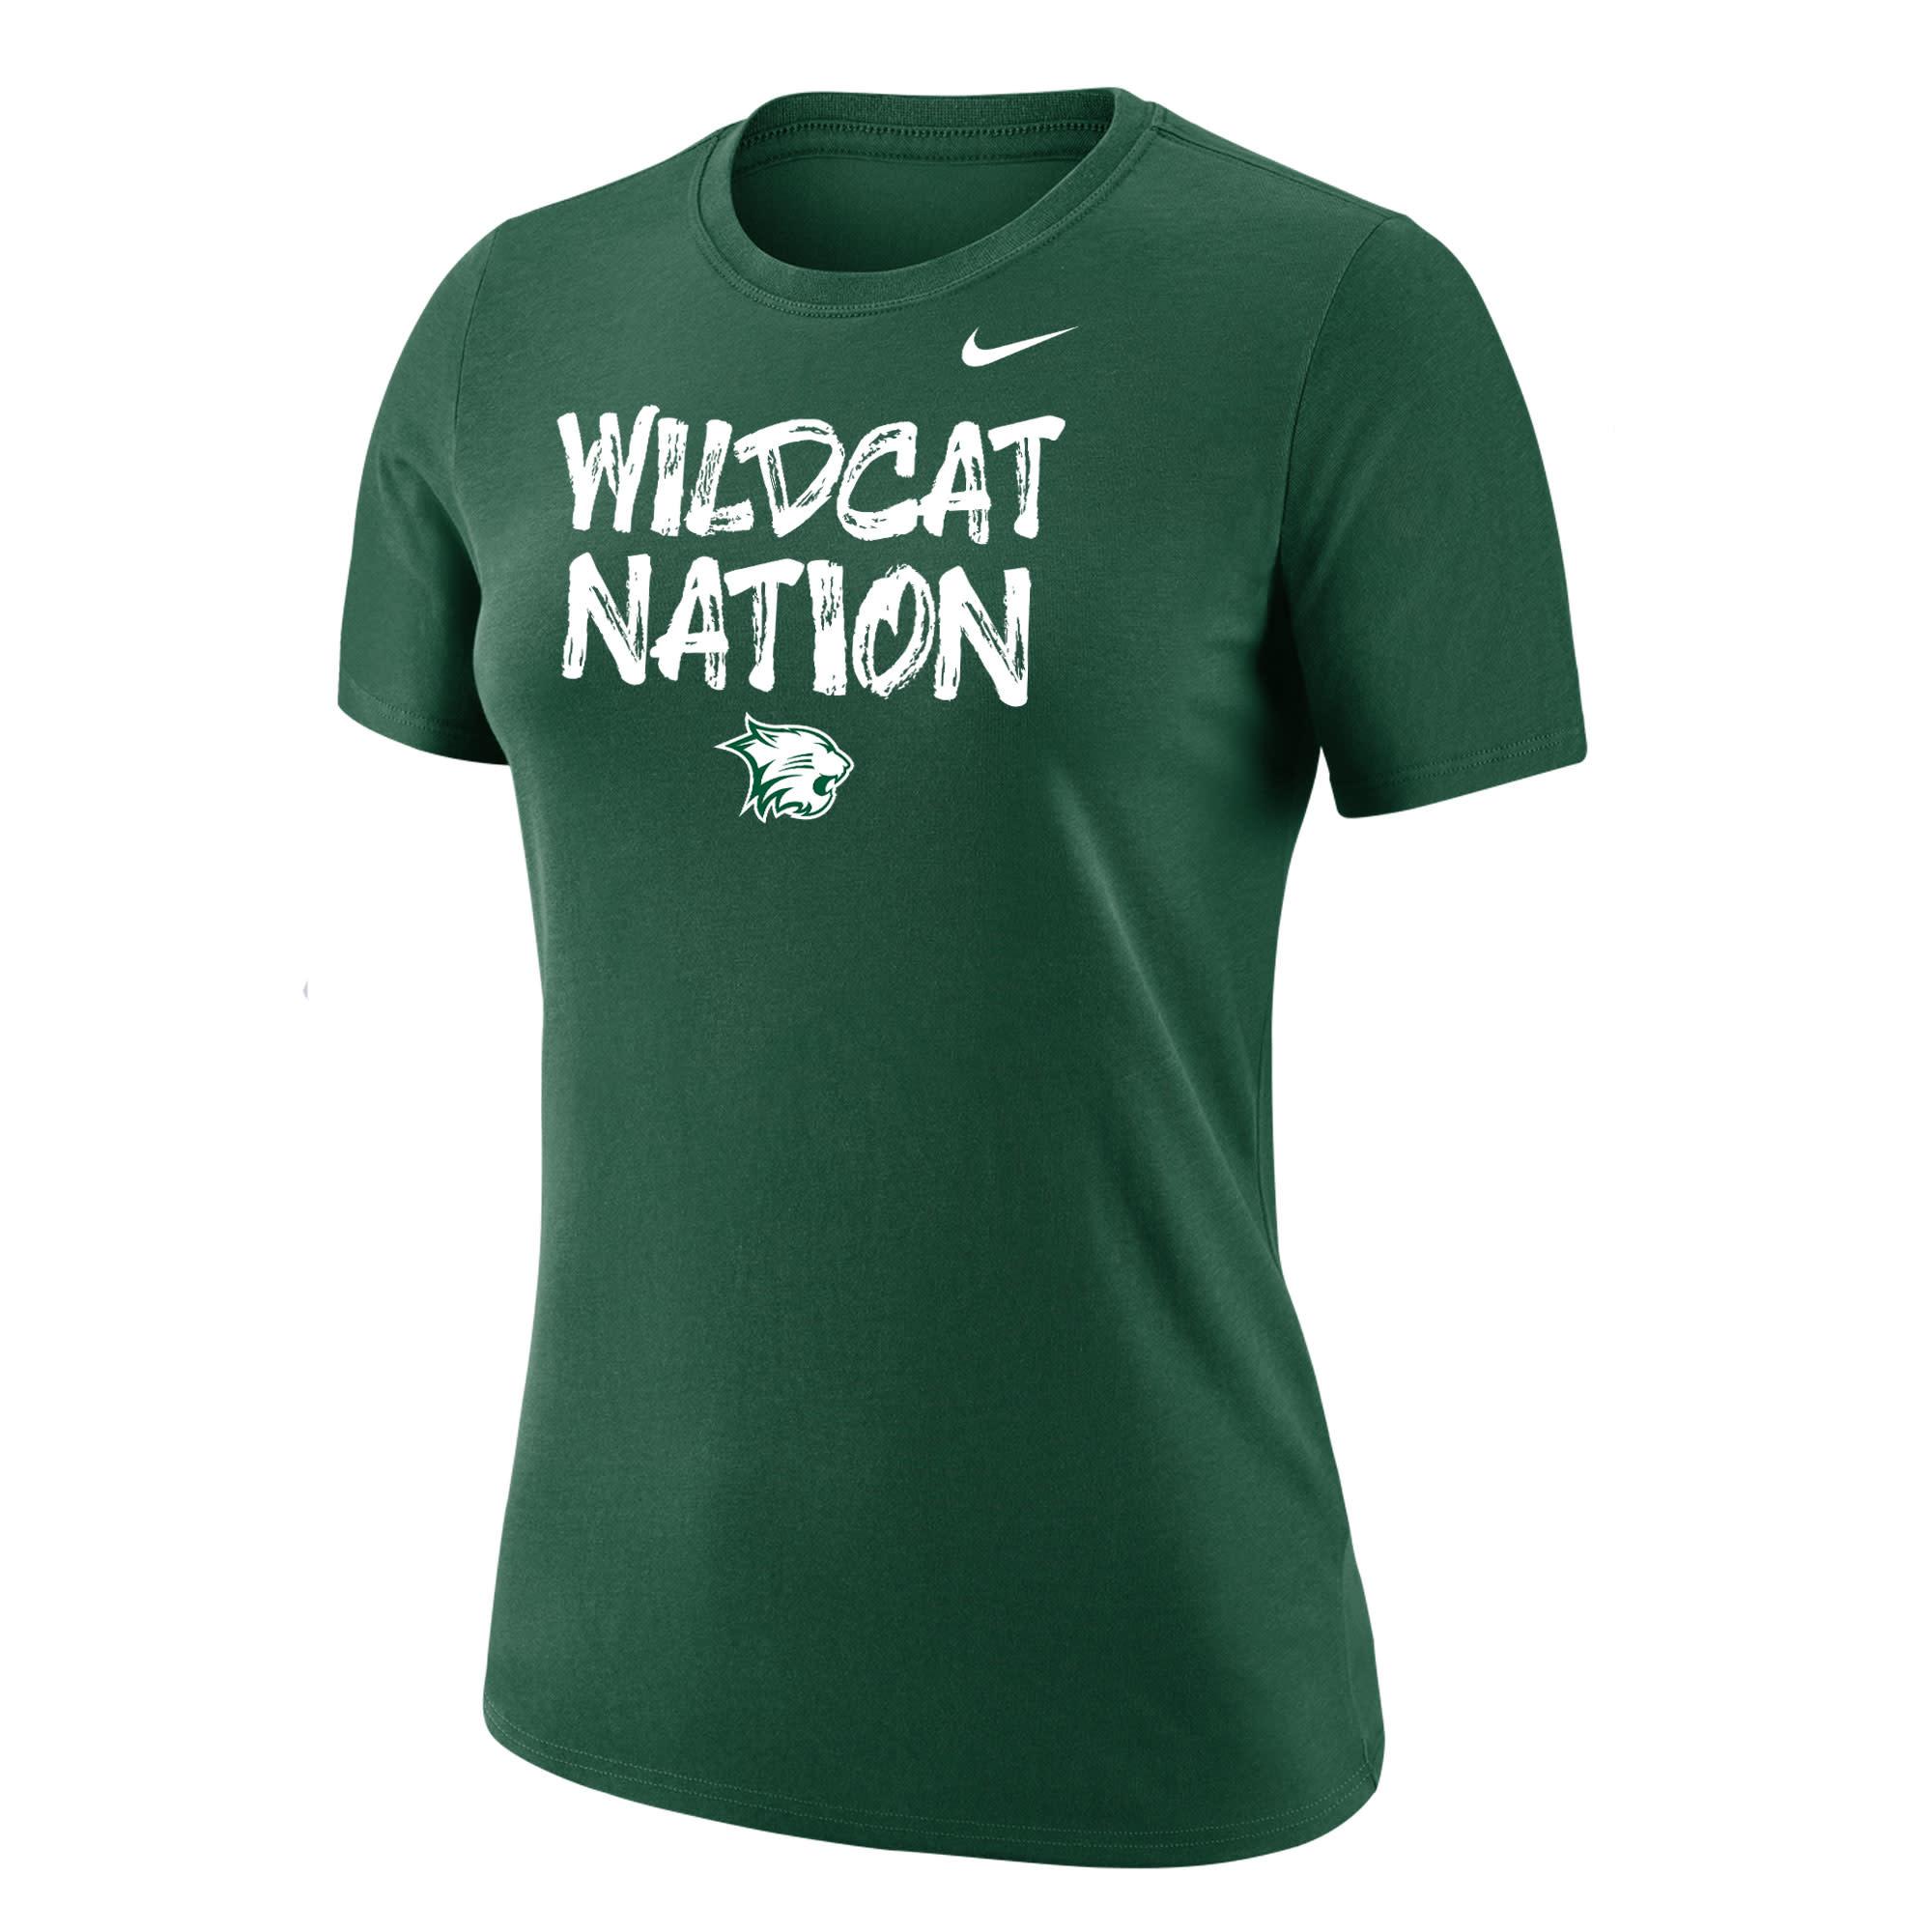 Nike T: Nike Women's Dri-Fit Cotton SS Wildcat Nation